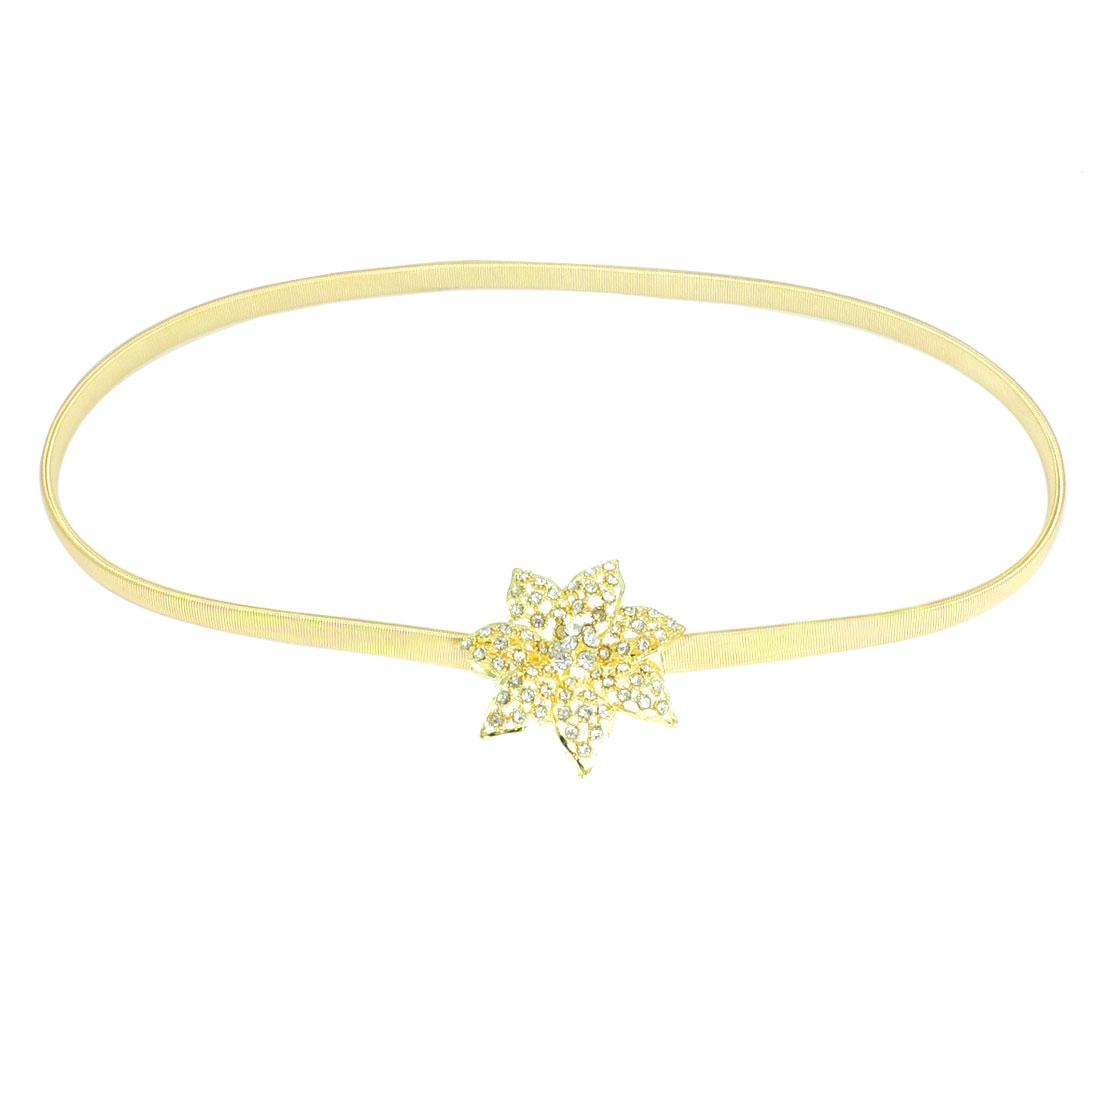 Ladies Floral Shape Interlocking Buckle Gold Tone Stretchy Cinch Belt